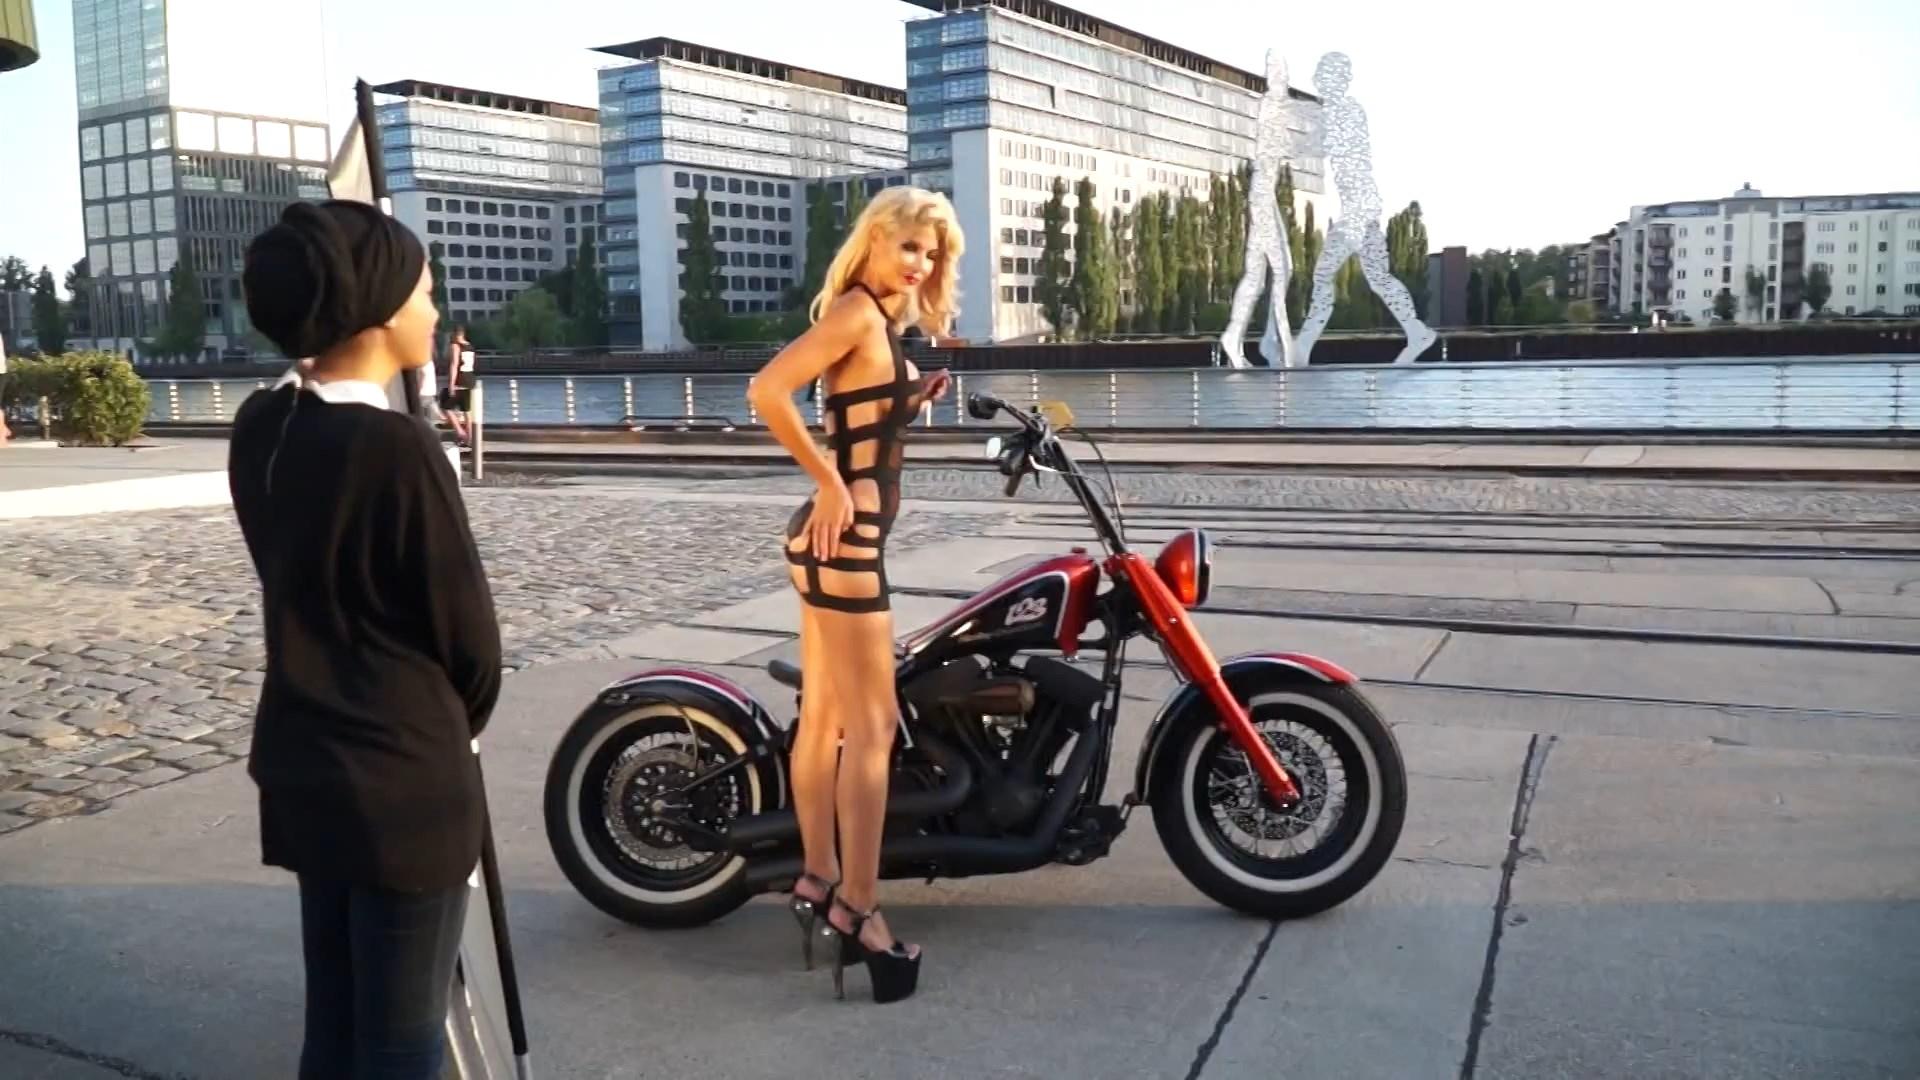 Micaela Schäfer Sexy (36 Photos)